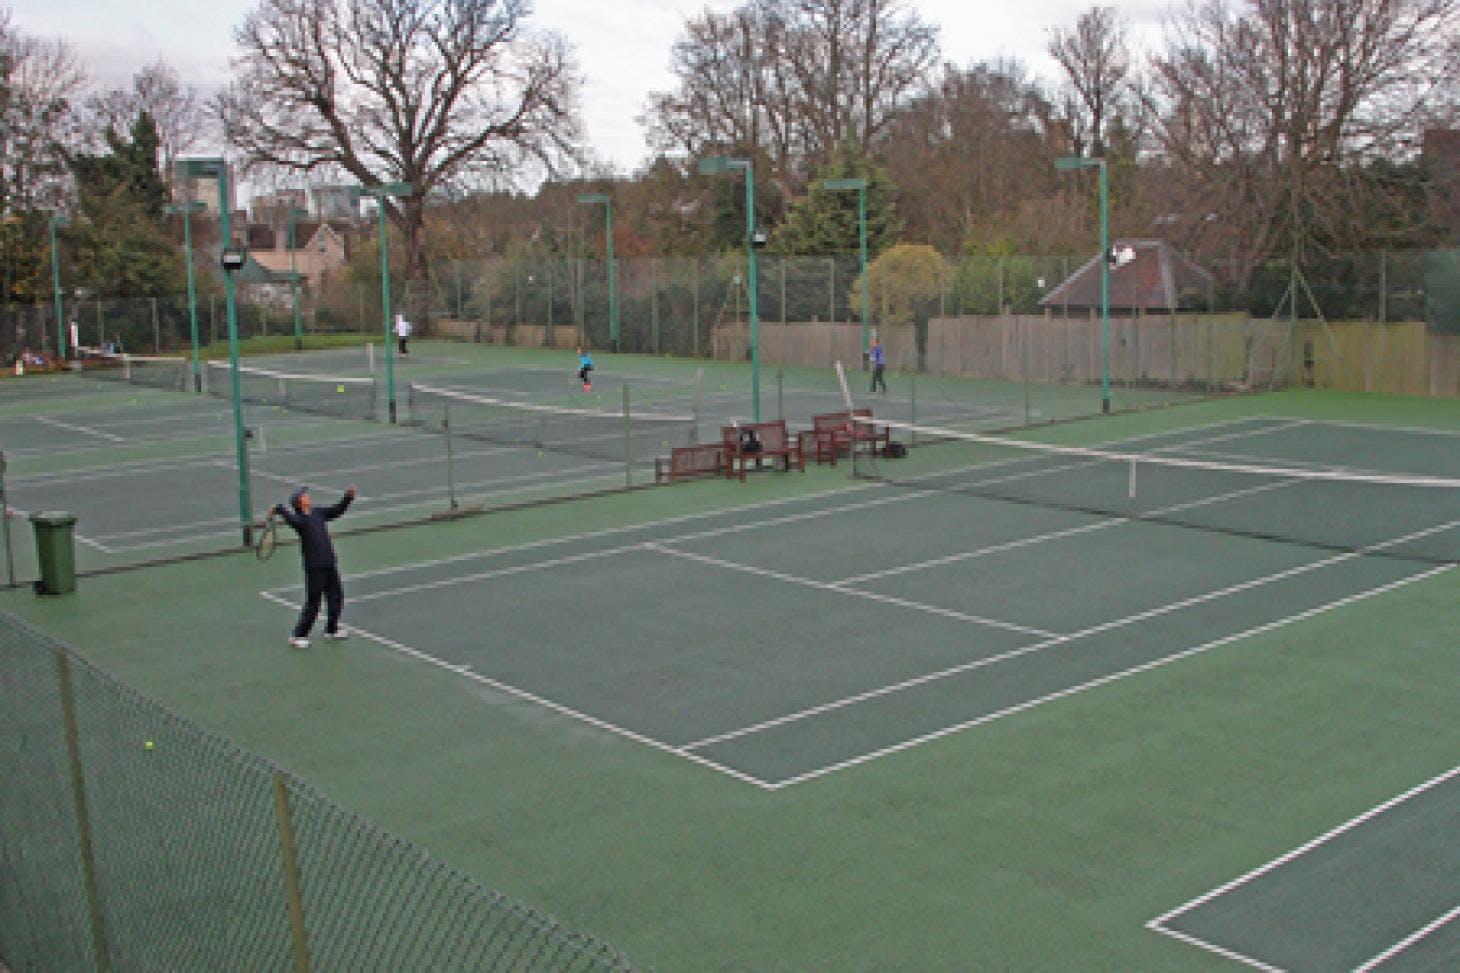 South Croydon Sports Club Outdoor | Hard (macadam) tennis court